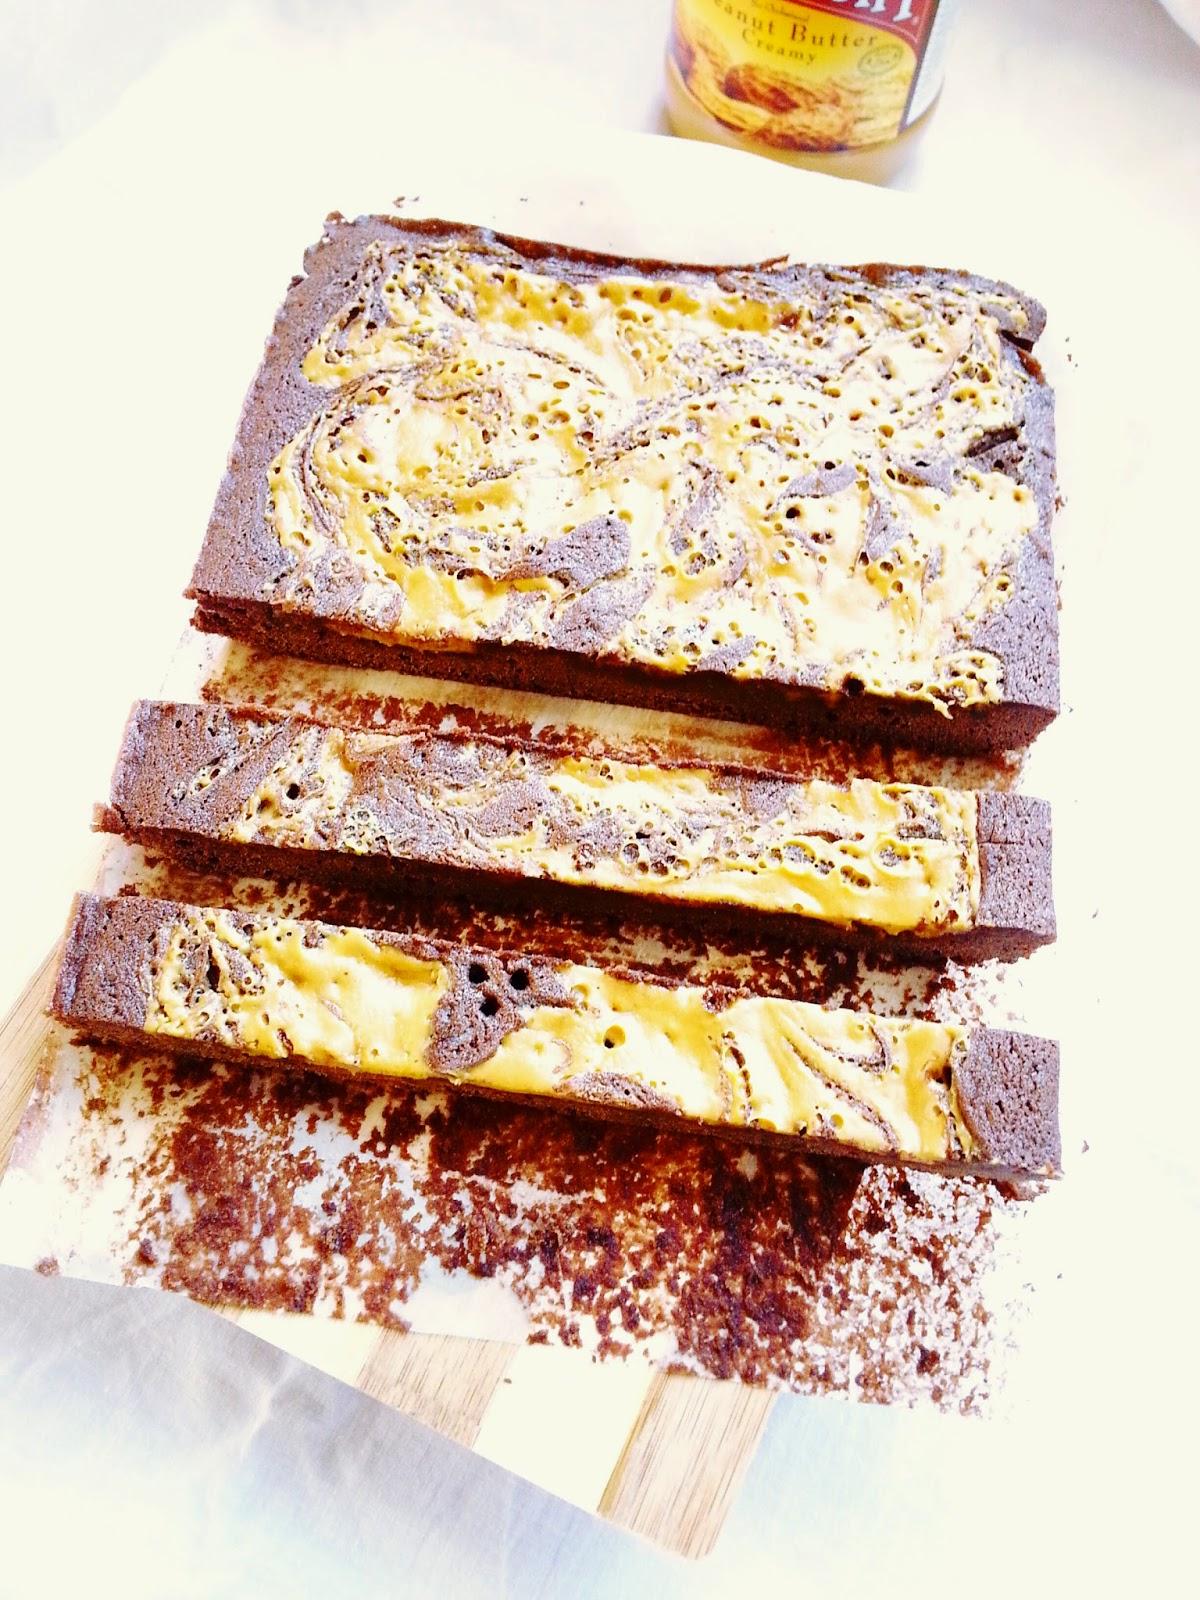 Resepi Brownies Bersama Mentega Kacang Sedap Rupanya